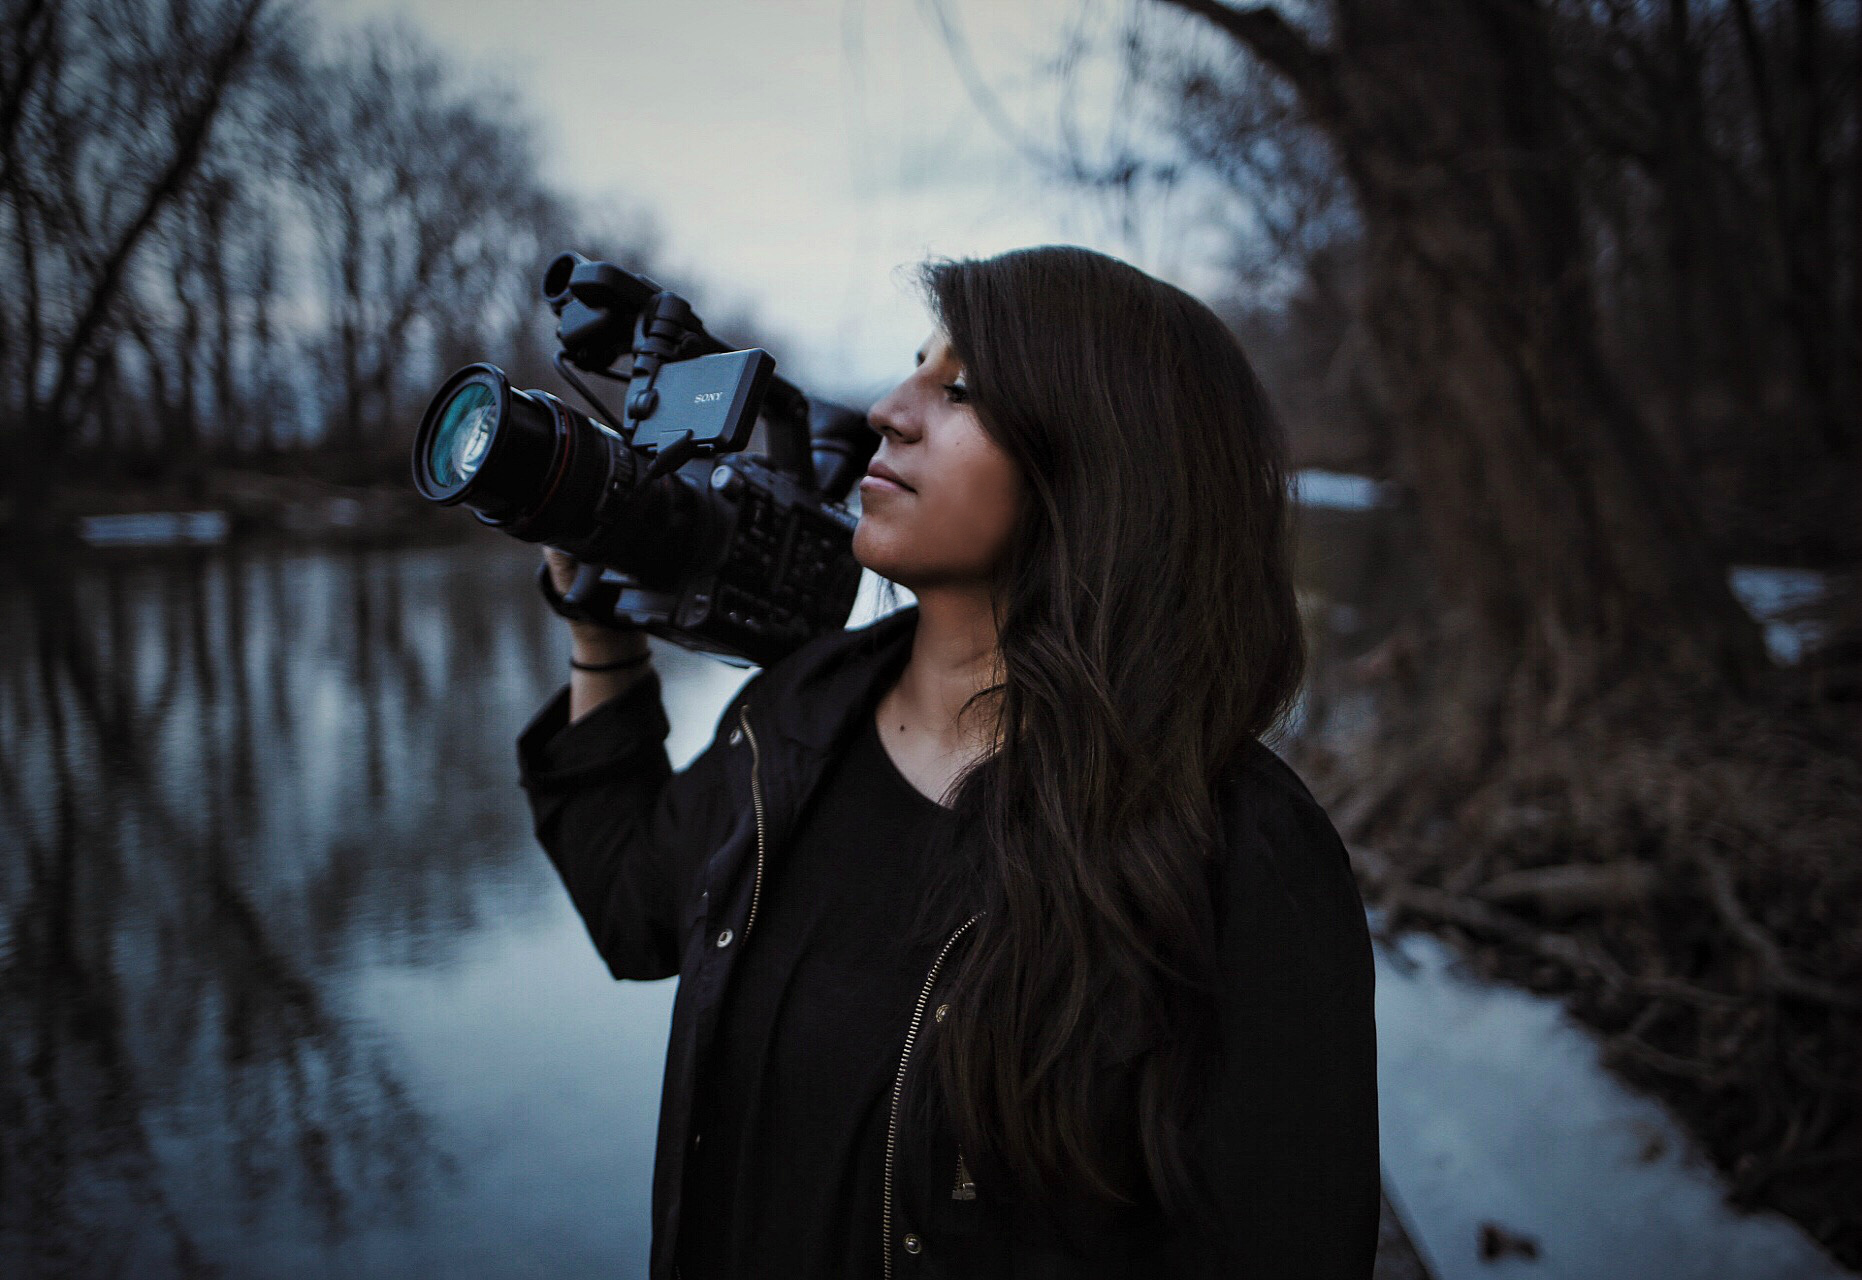 On set/ short film. Photo Cred:  Abby Floyd